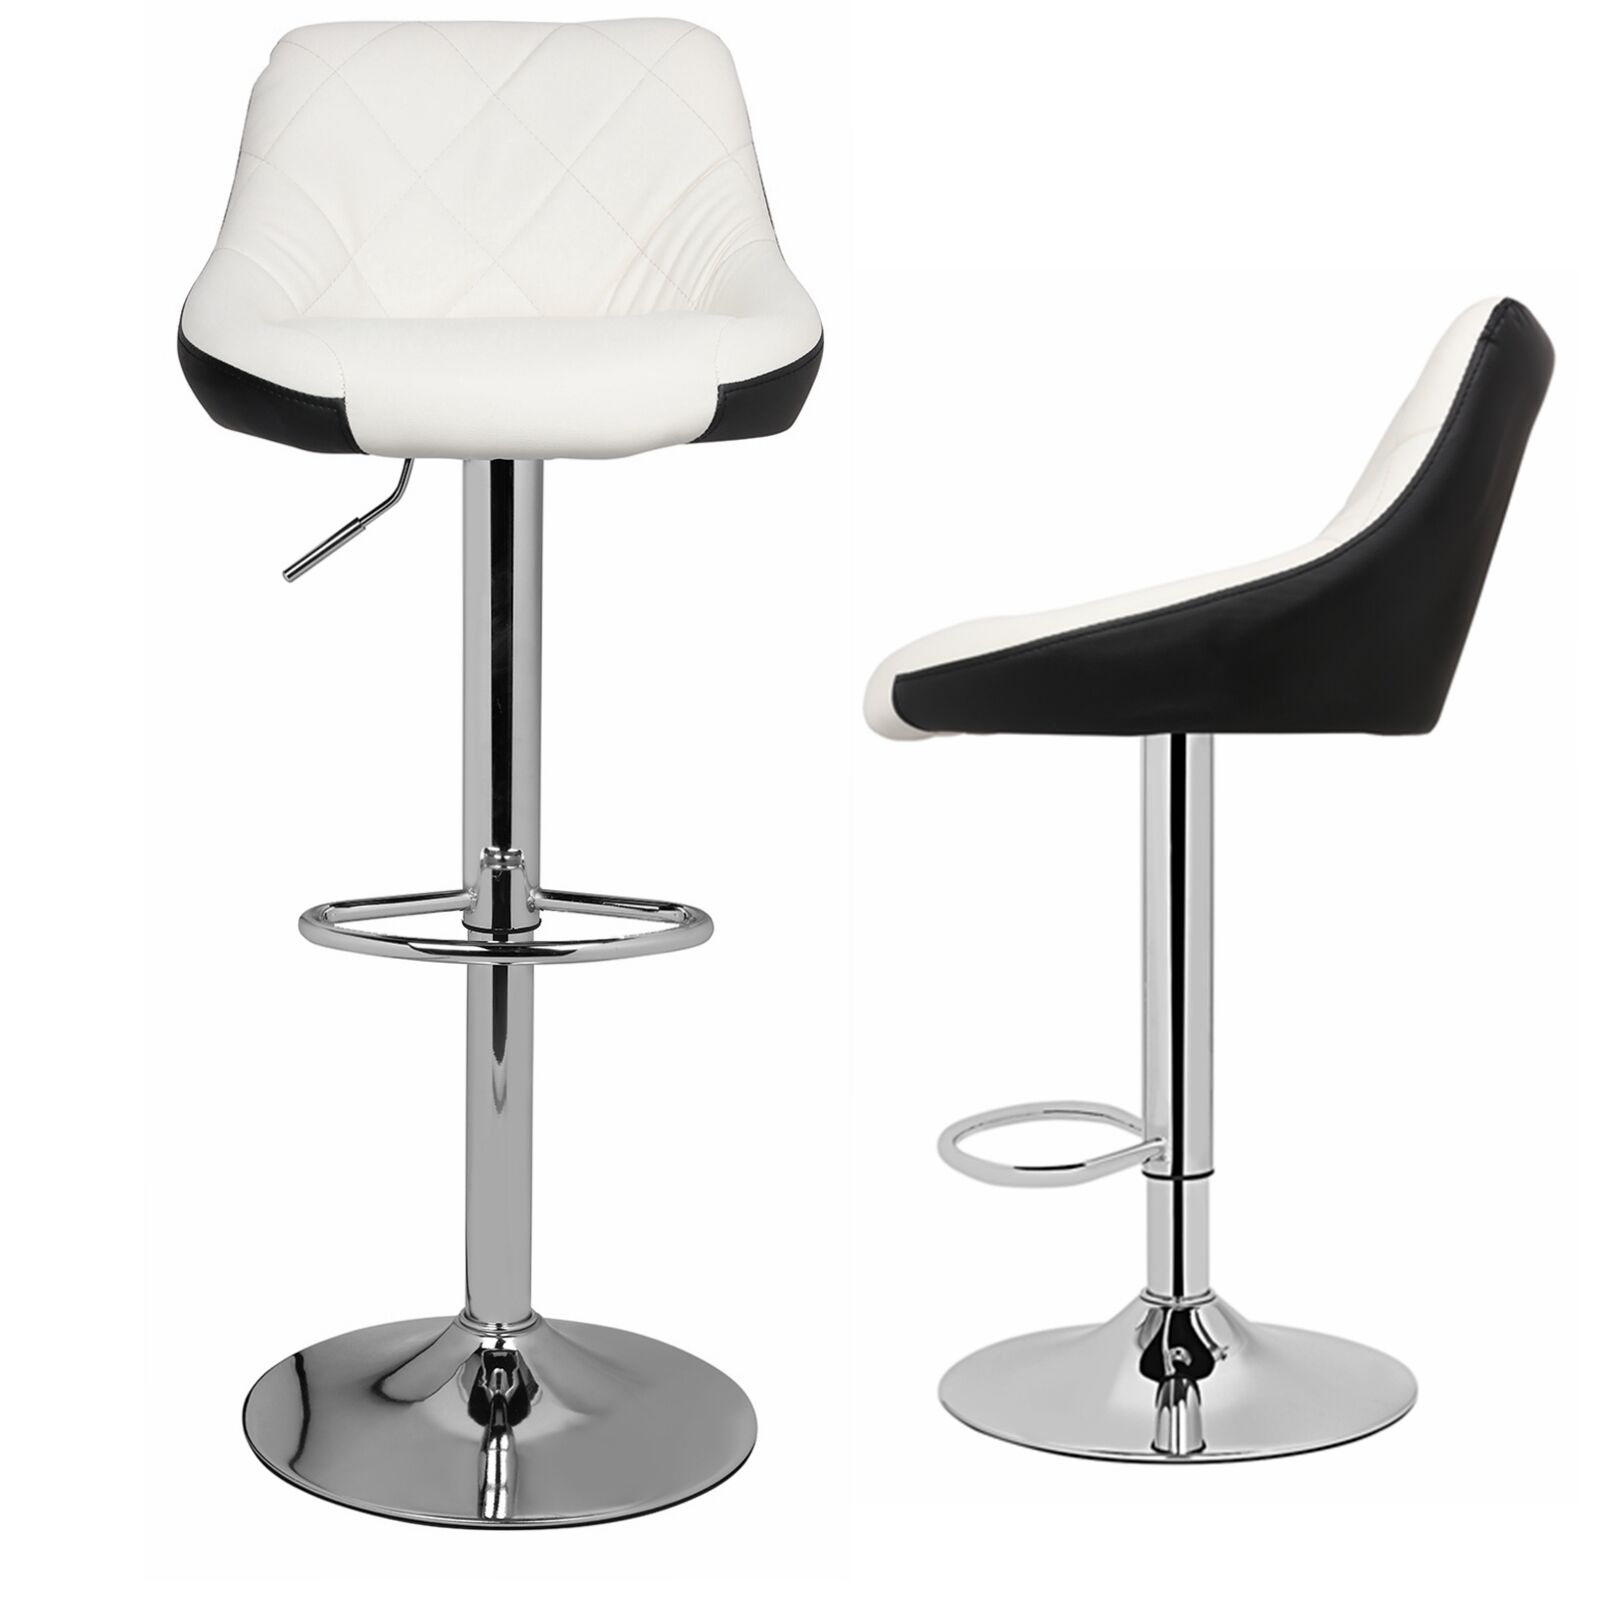 Model Mix Black & White Bar Stool Chair Adjustable Home Coun